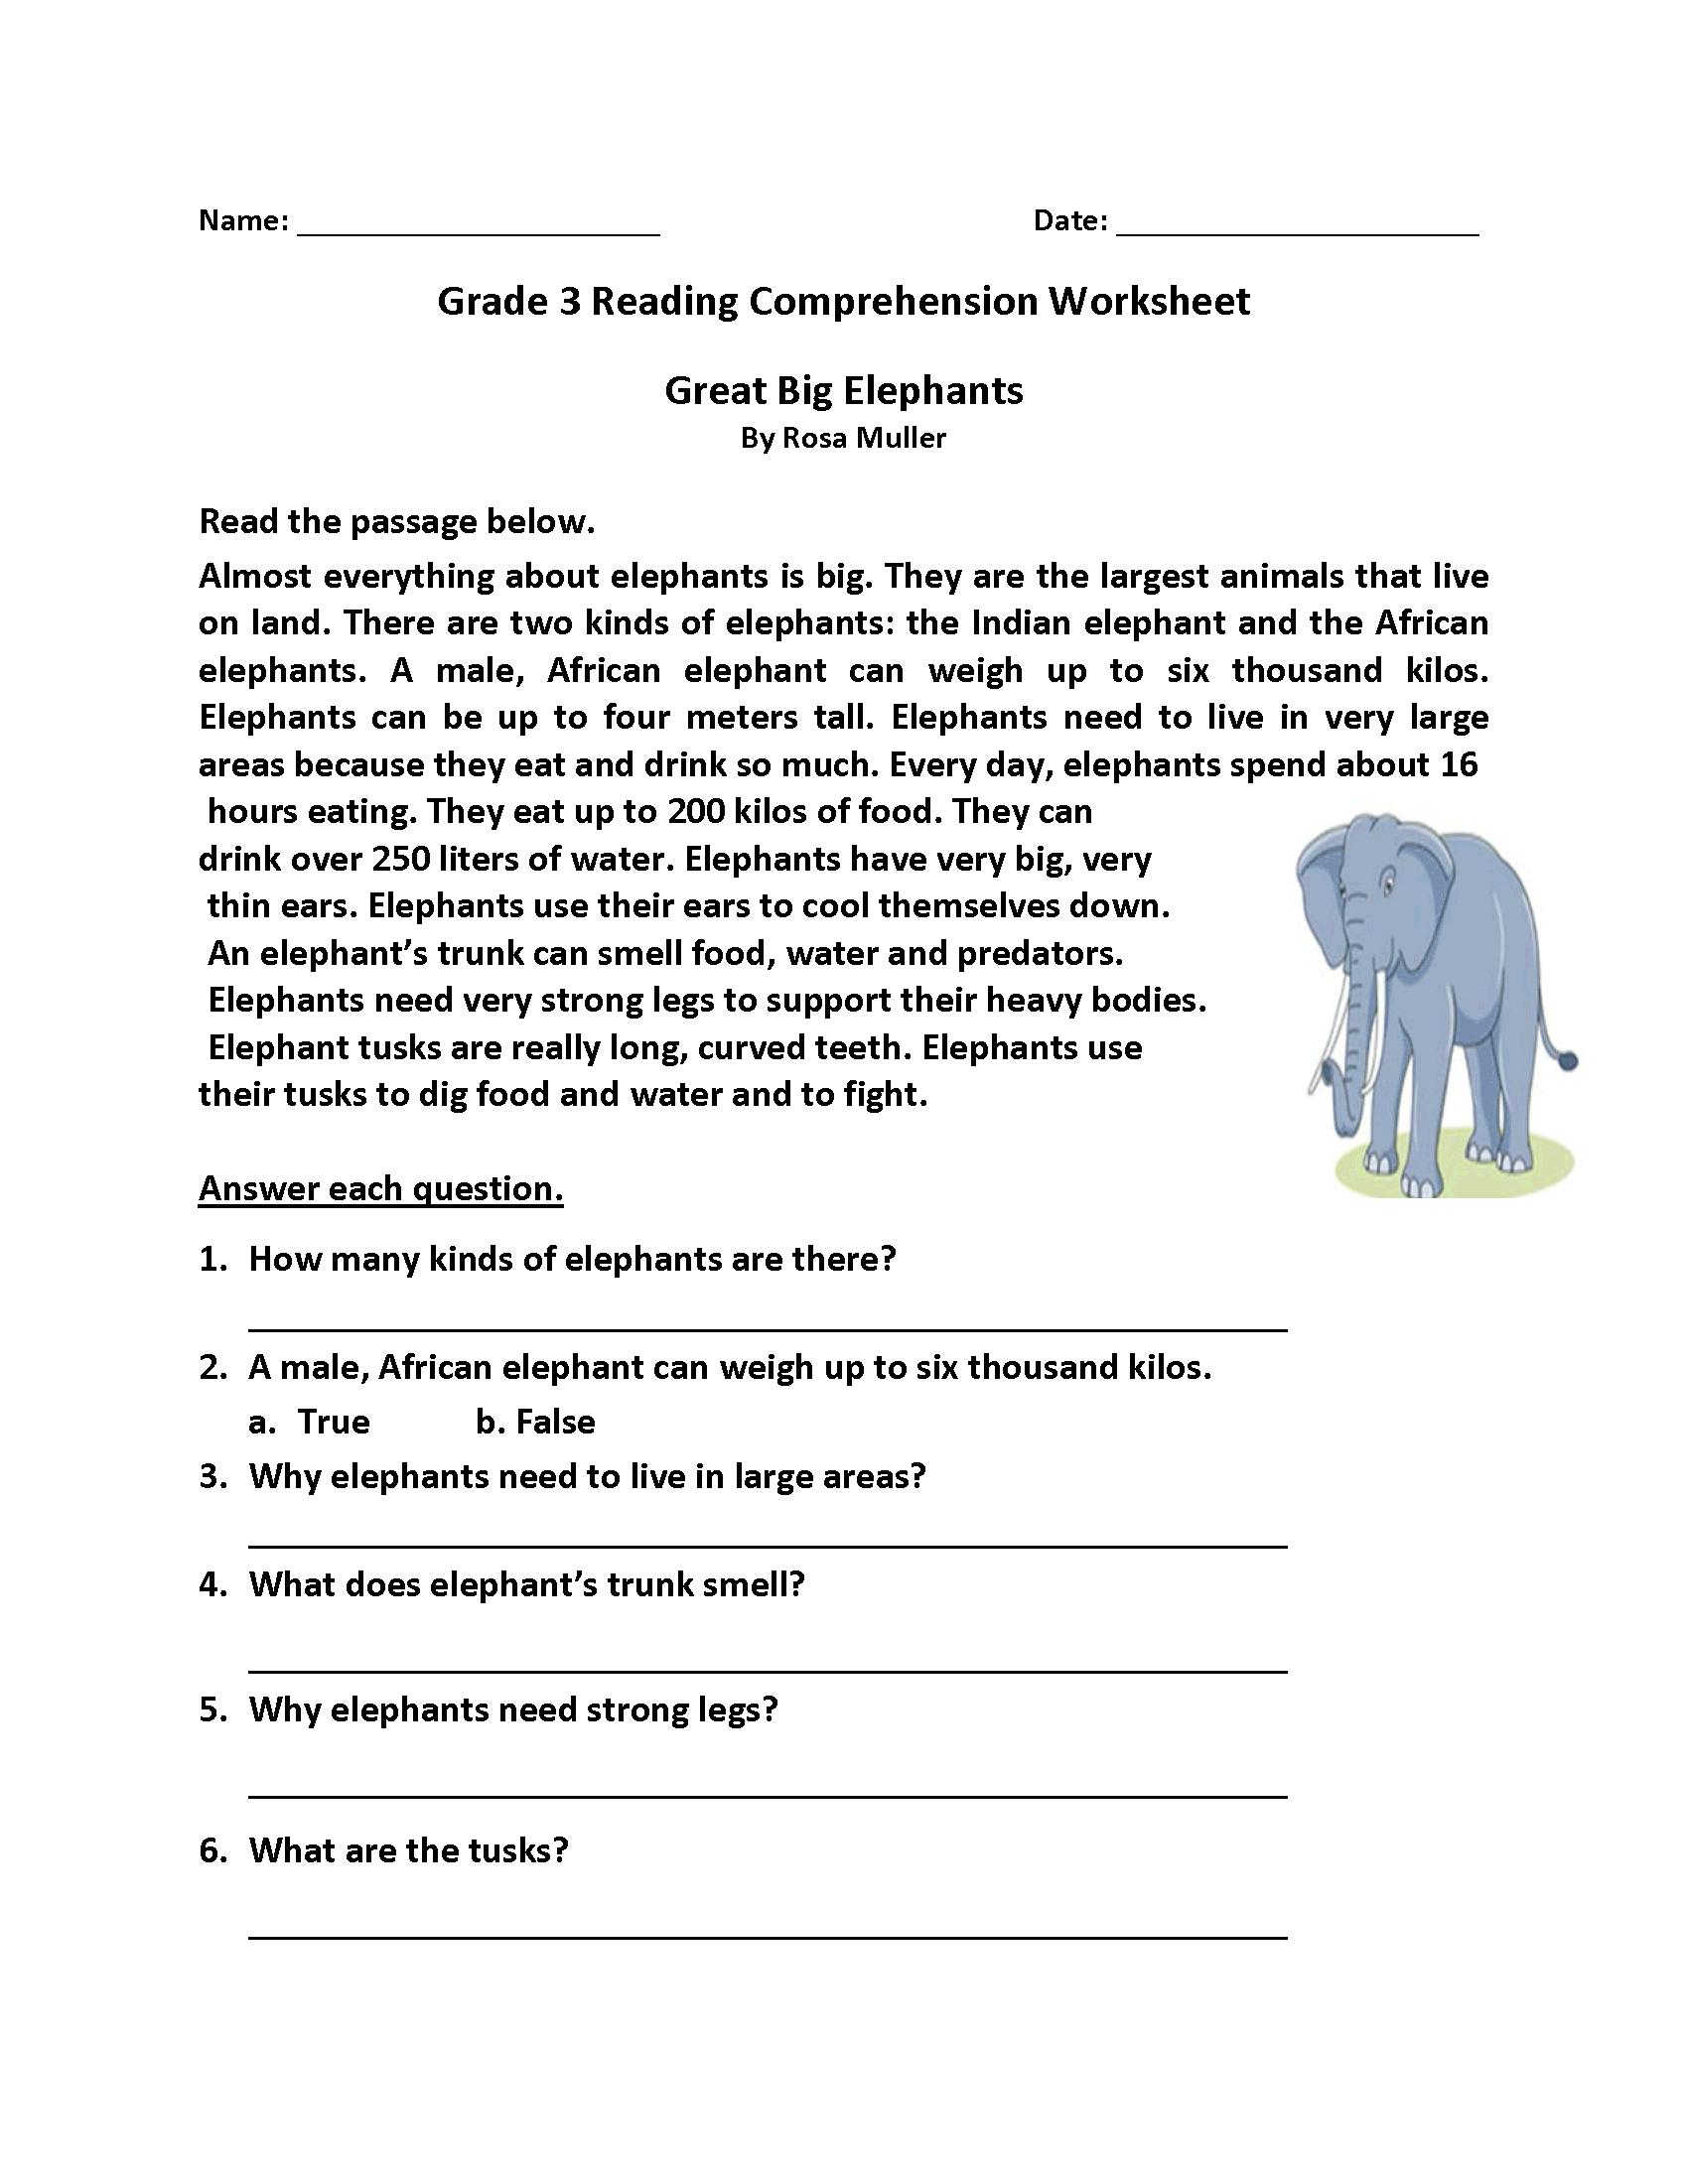 Homework Sheets Grade 3 Reading | Learning Printable | Reading | Printable Comprehension Worksheets For Grade 3